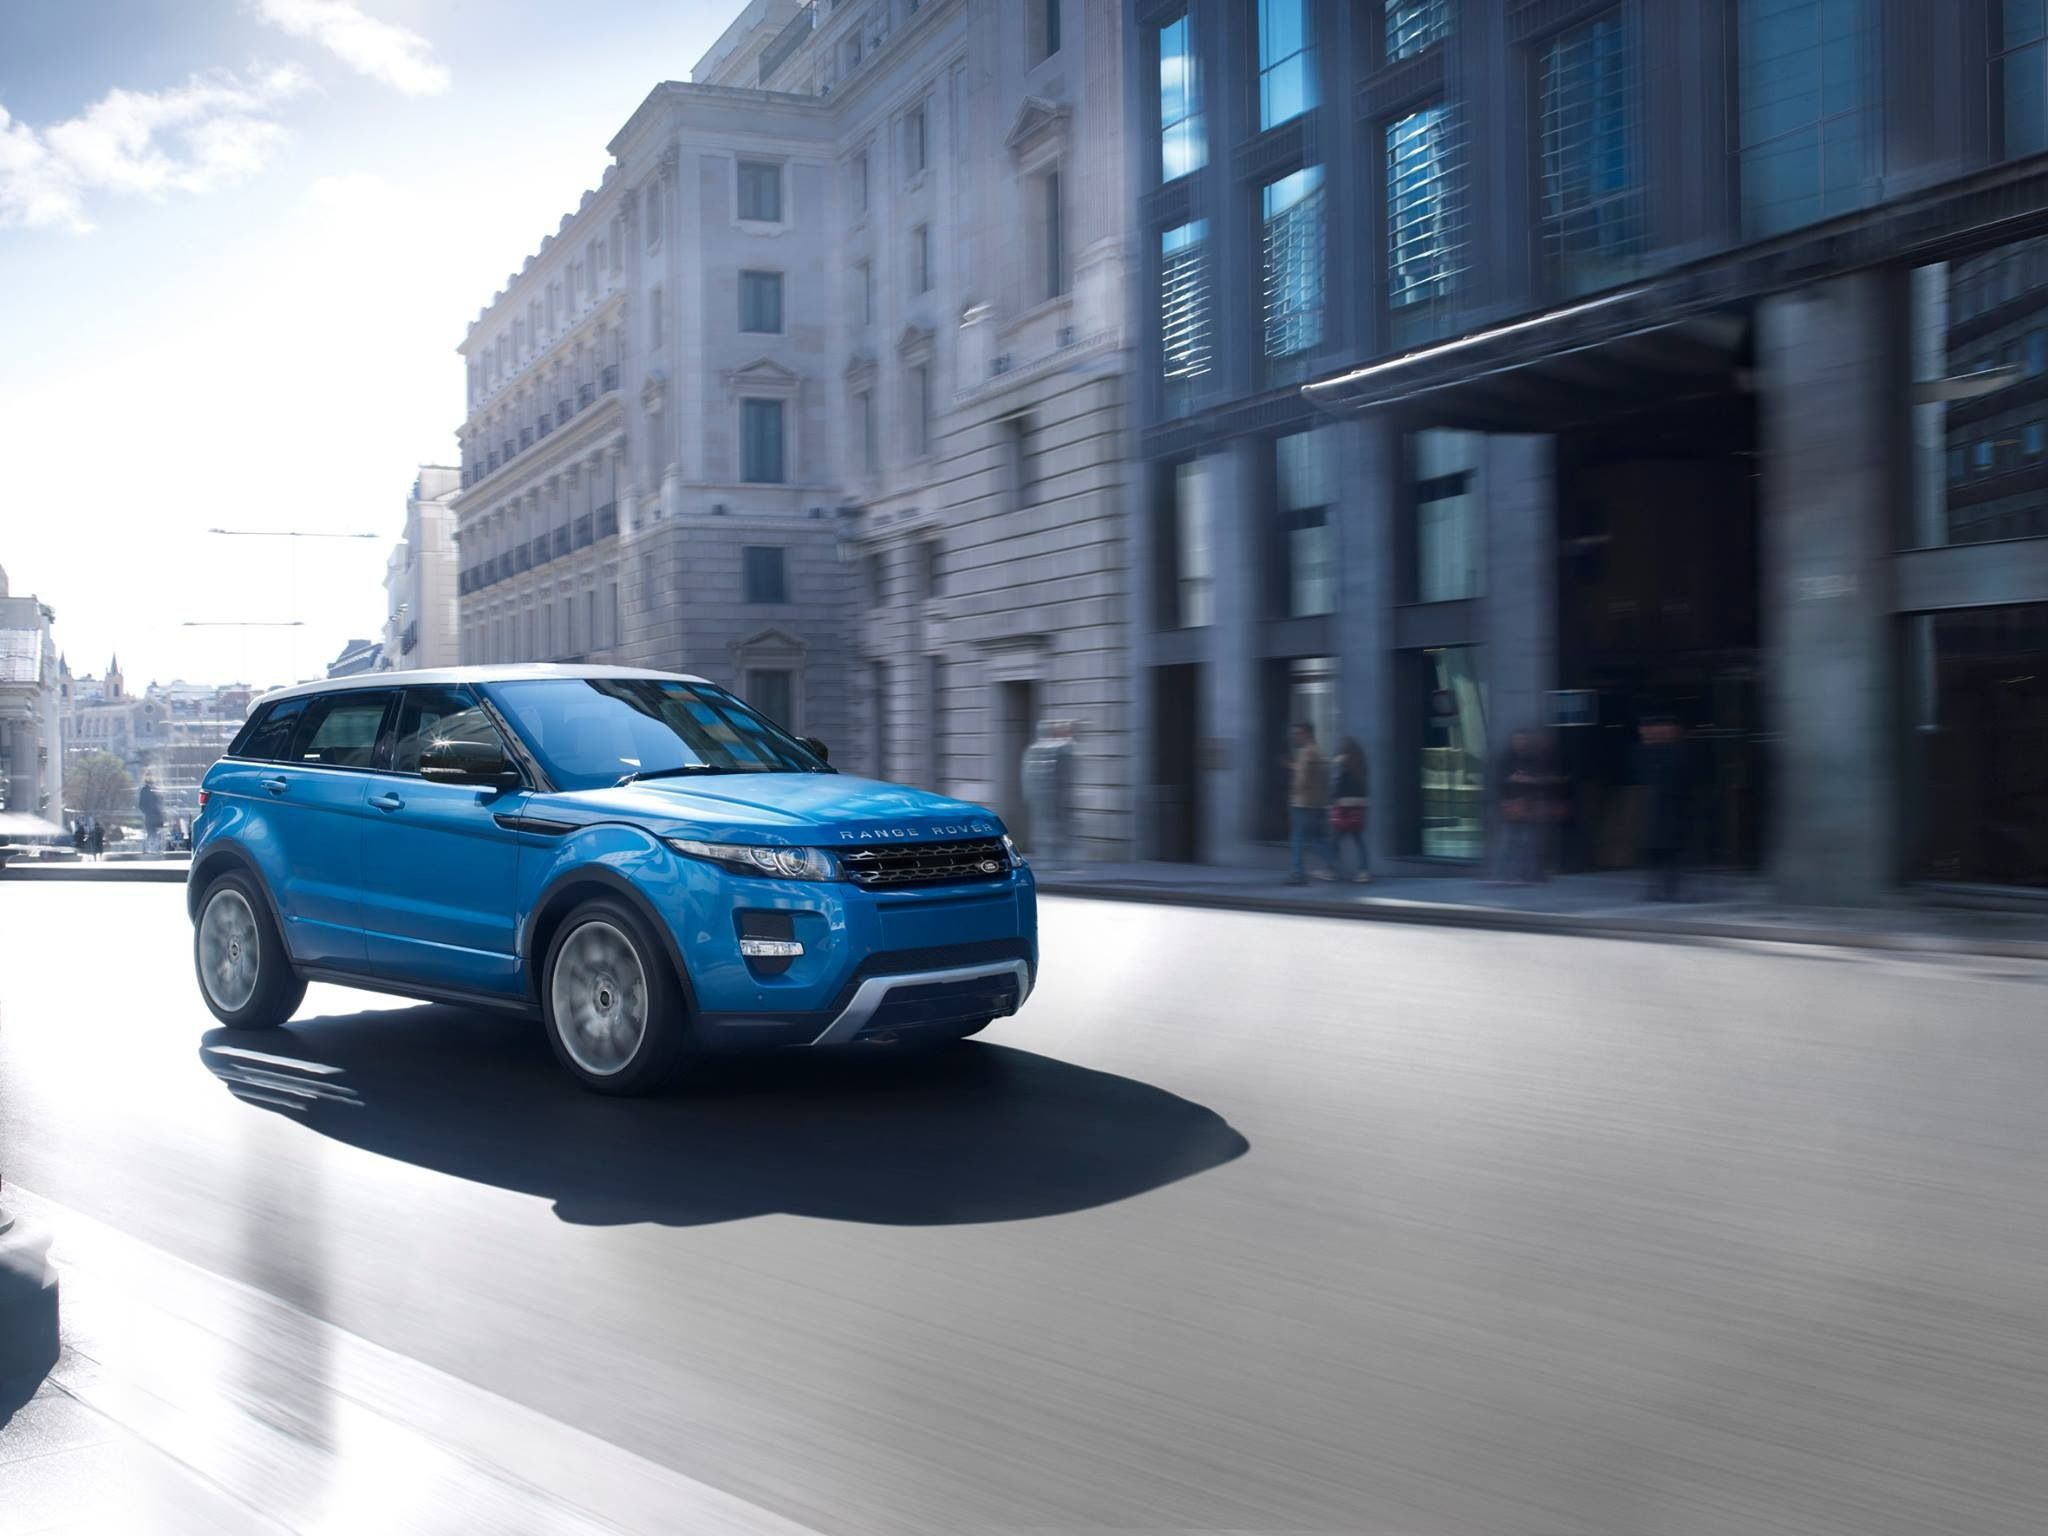 Evoque Range Rover Evoque Range Rover New Range Rover Evoque